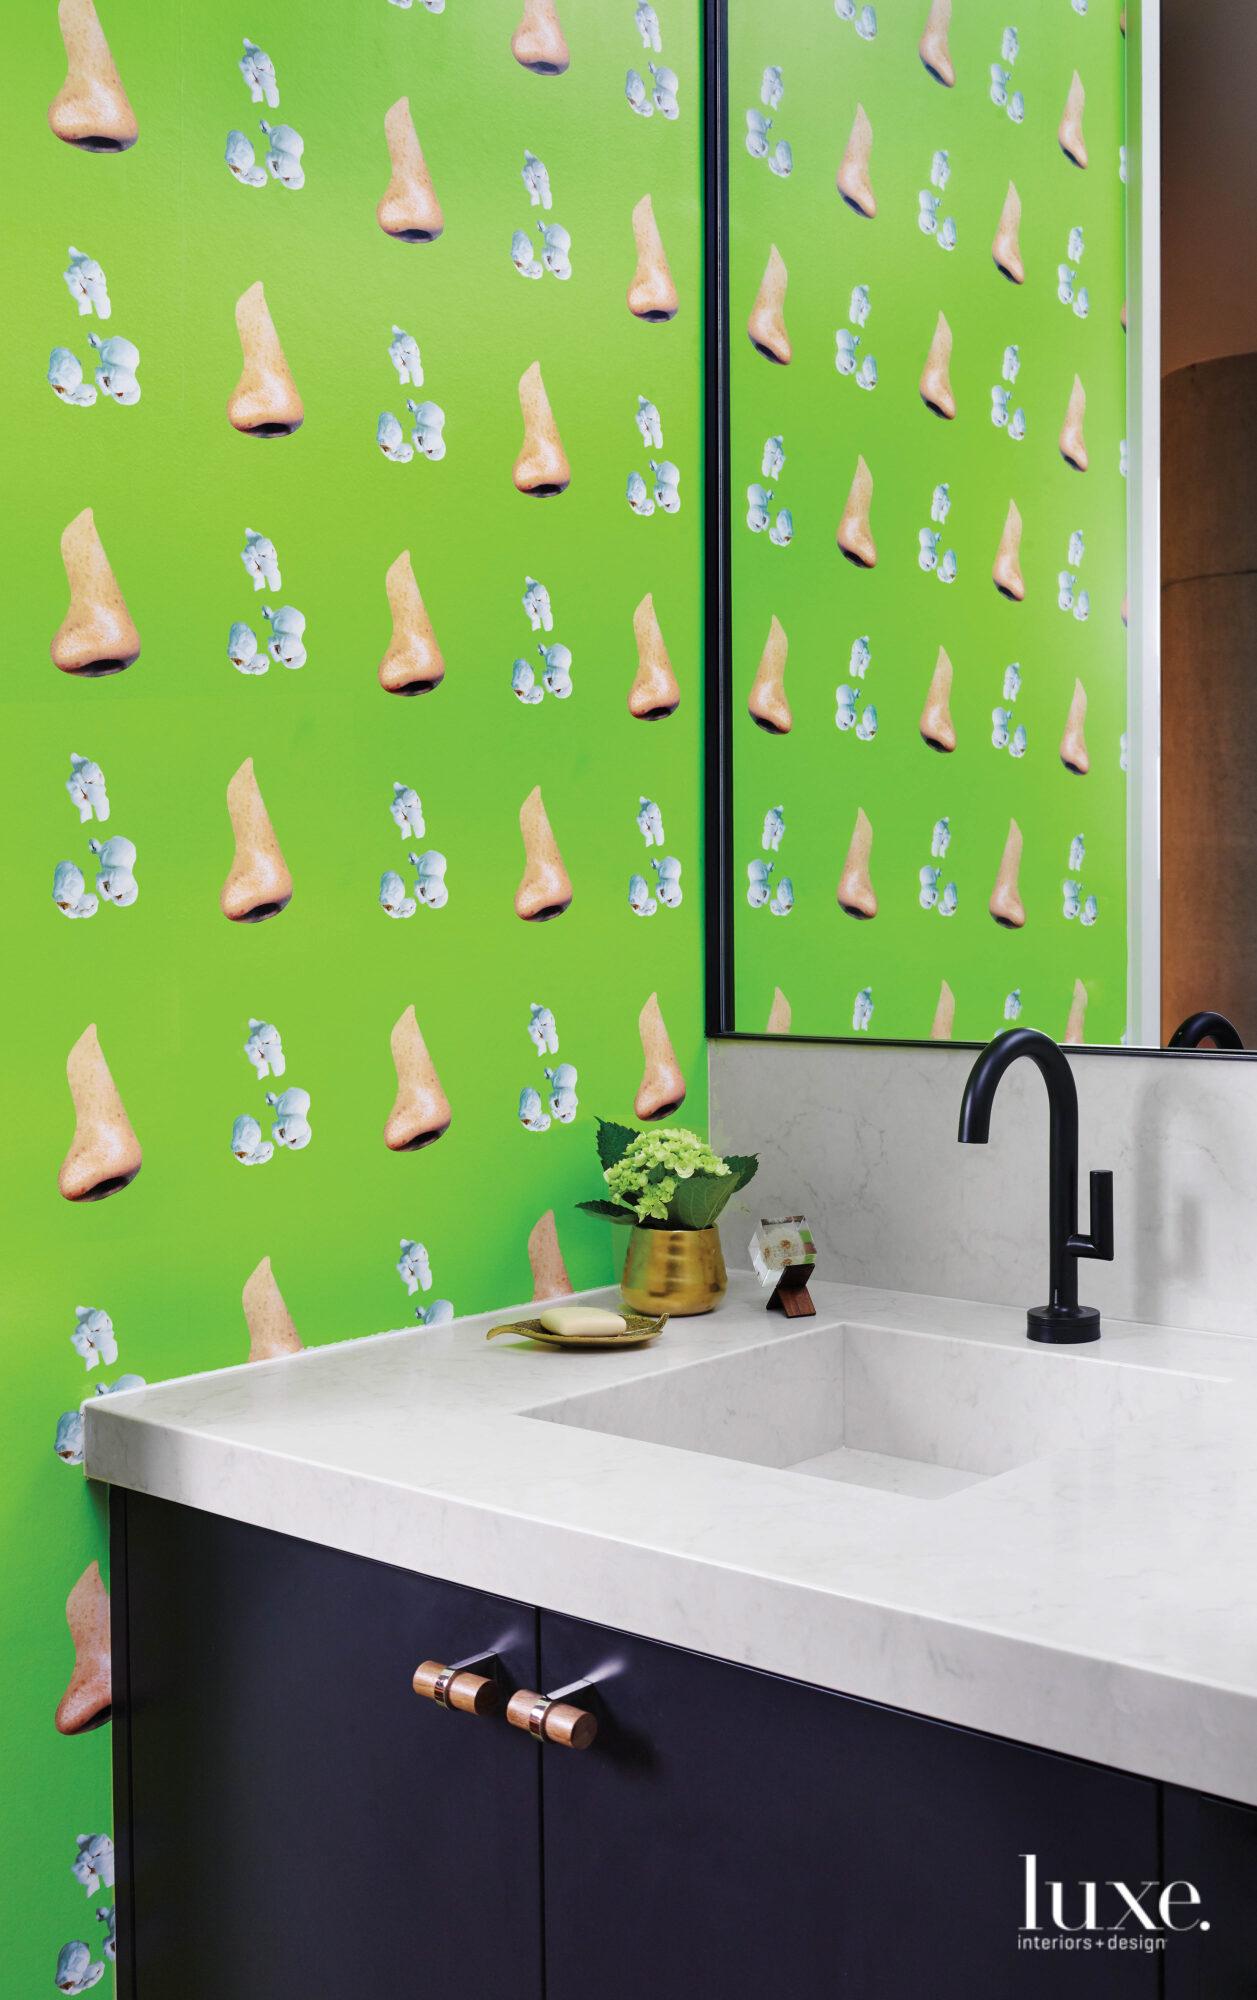 Cheeky powder bathroom with wallpaper...